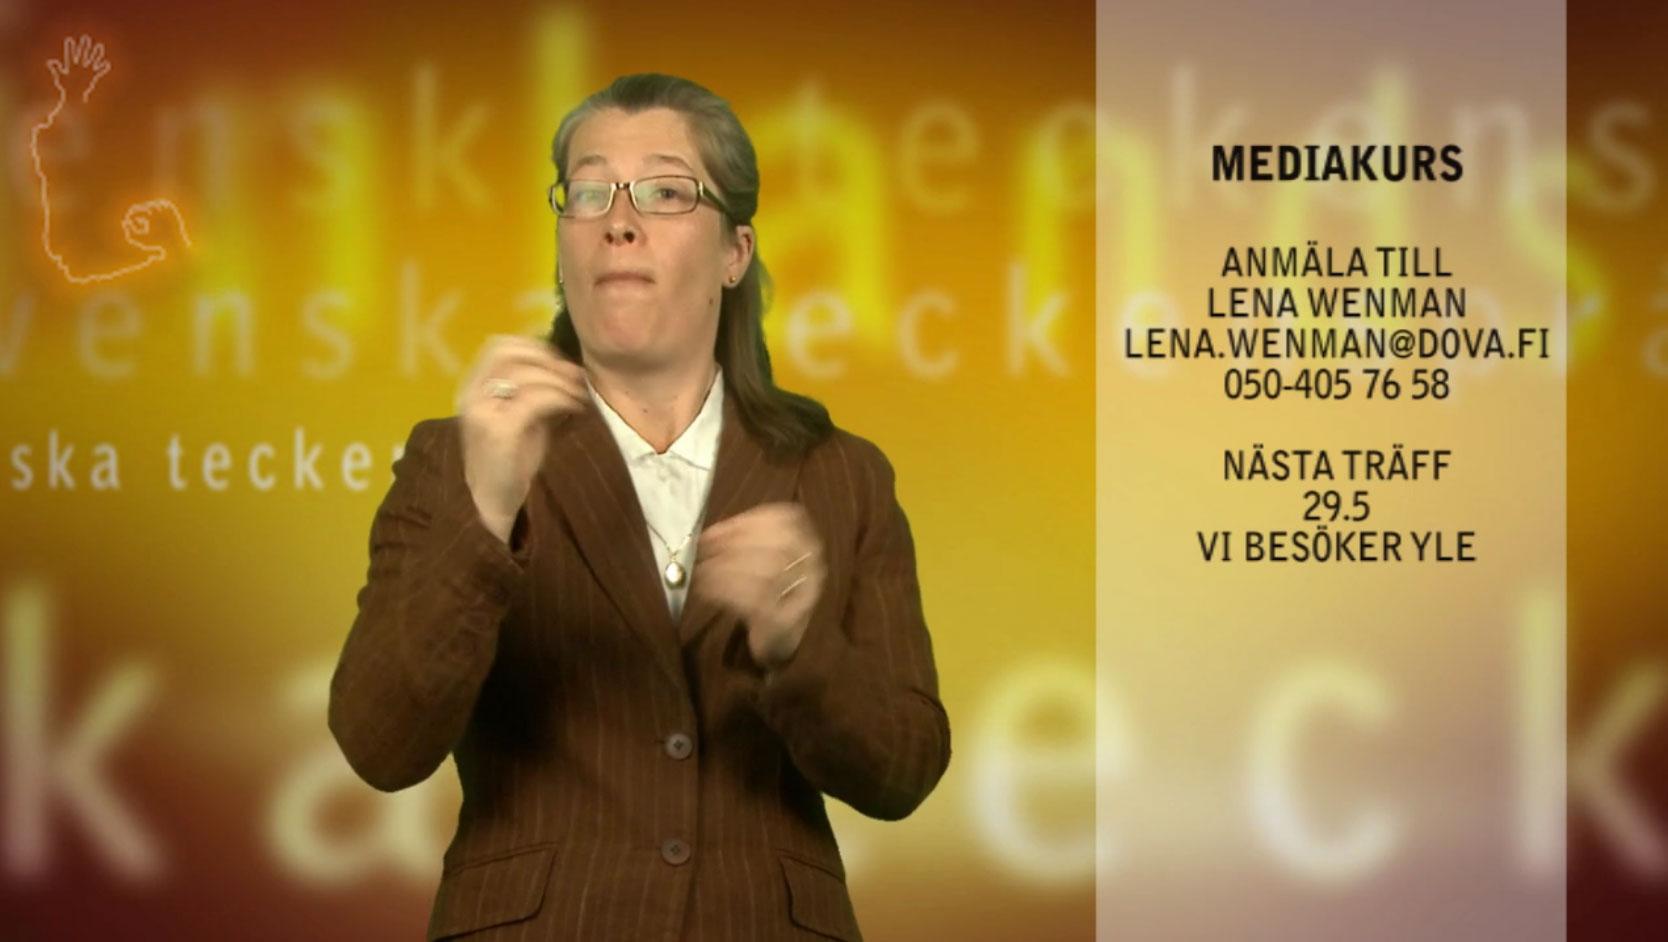 Nyheter 10/2011